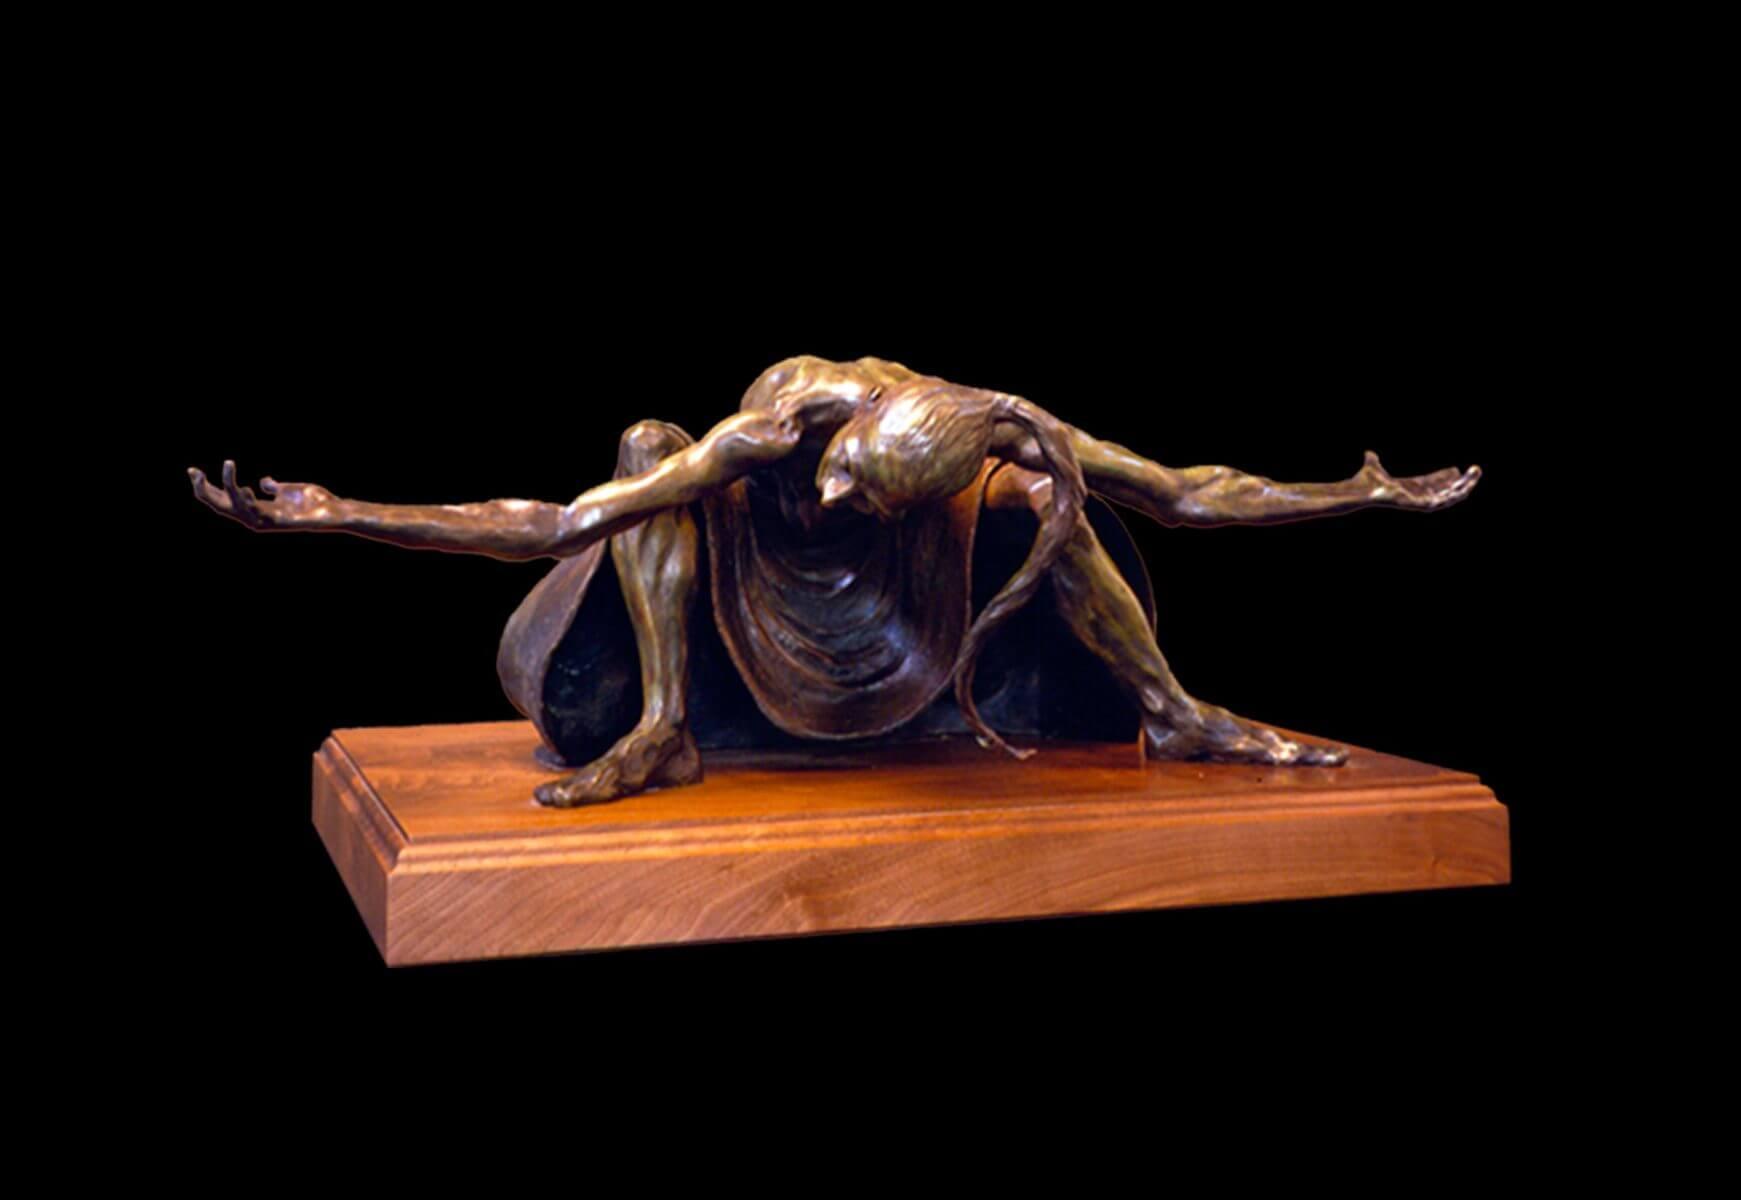 Rebecca a large fremale bronze dancer by sculptor Andrew DeVries